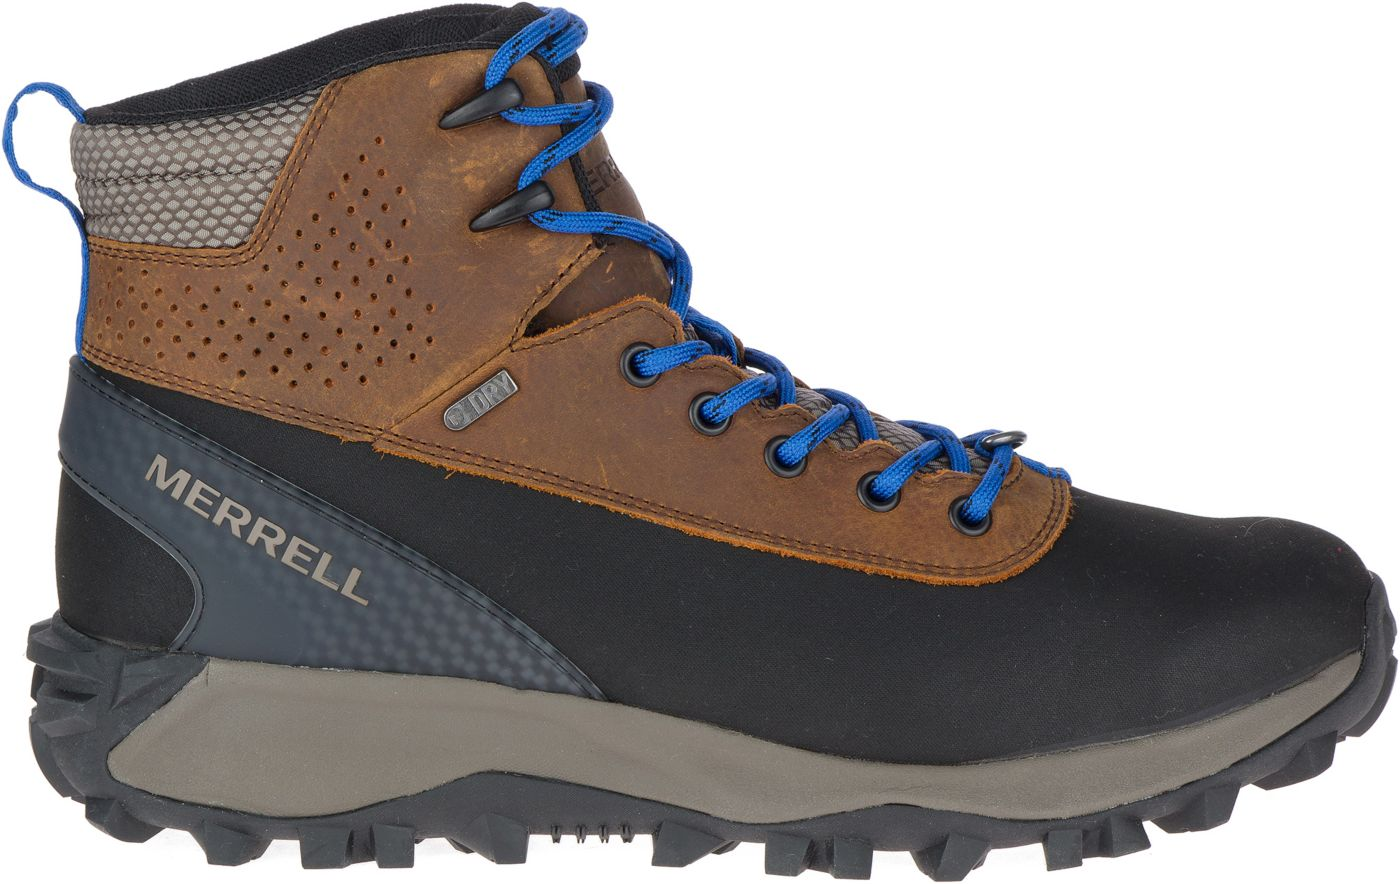 Merrell Men's Thermo Kiruna Mid Shell 200g Waterproof Hiking Boots